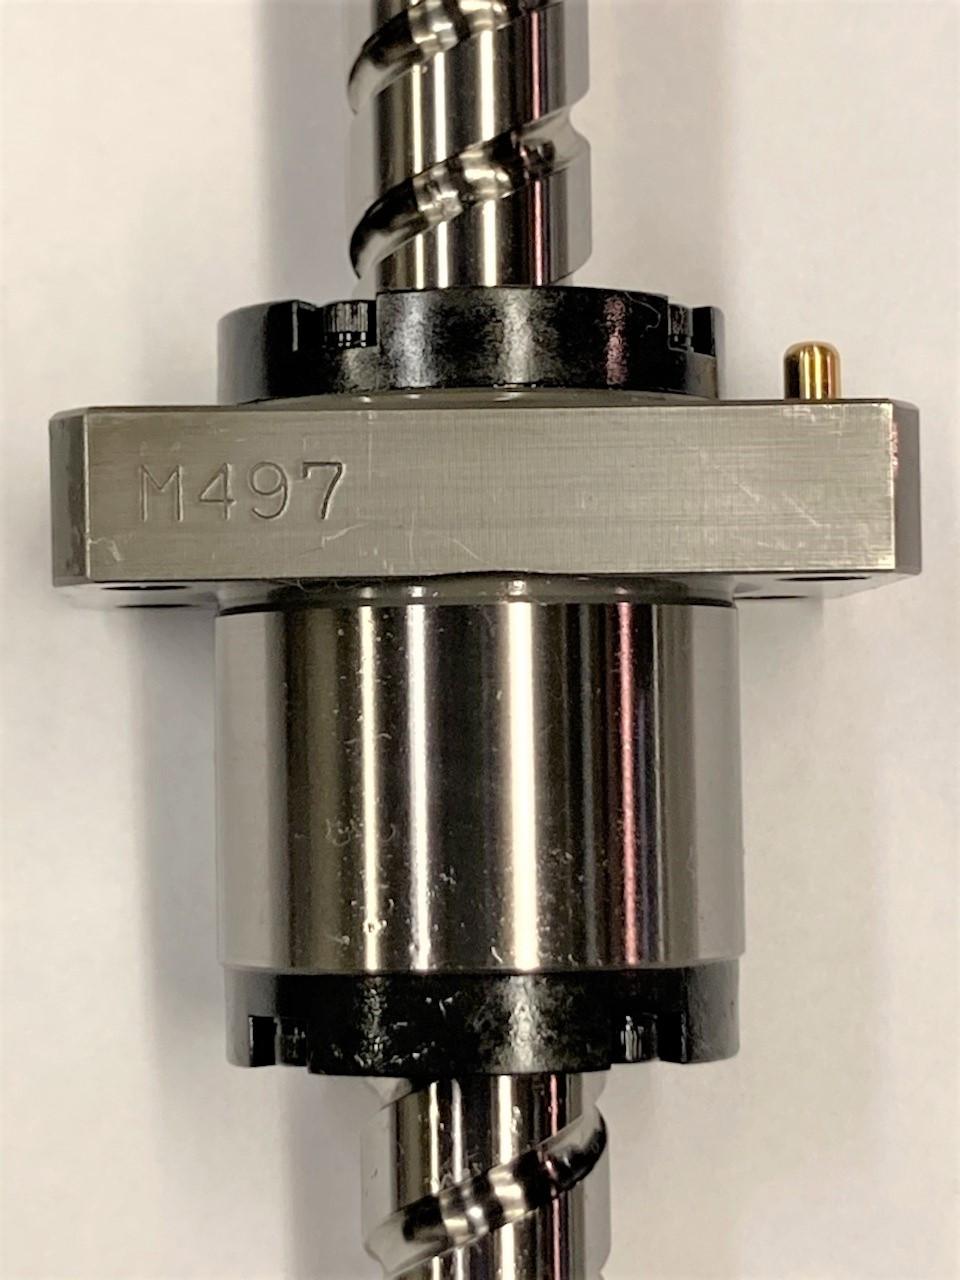 Z Axis Ball Screw  YK500XG YK600XG YK700XG YK800XG 200MM Stroke